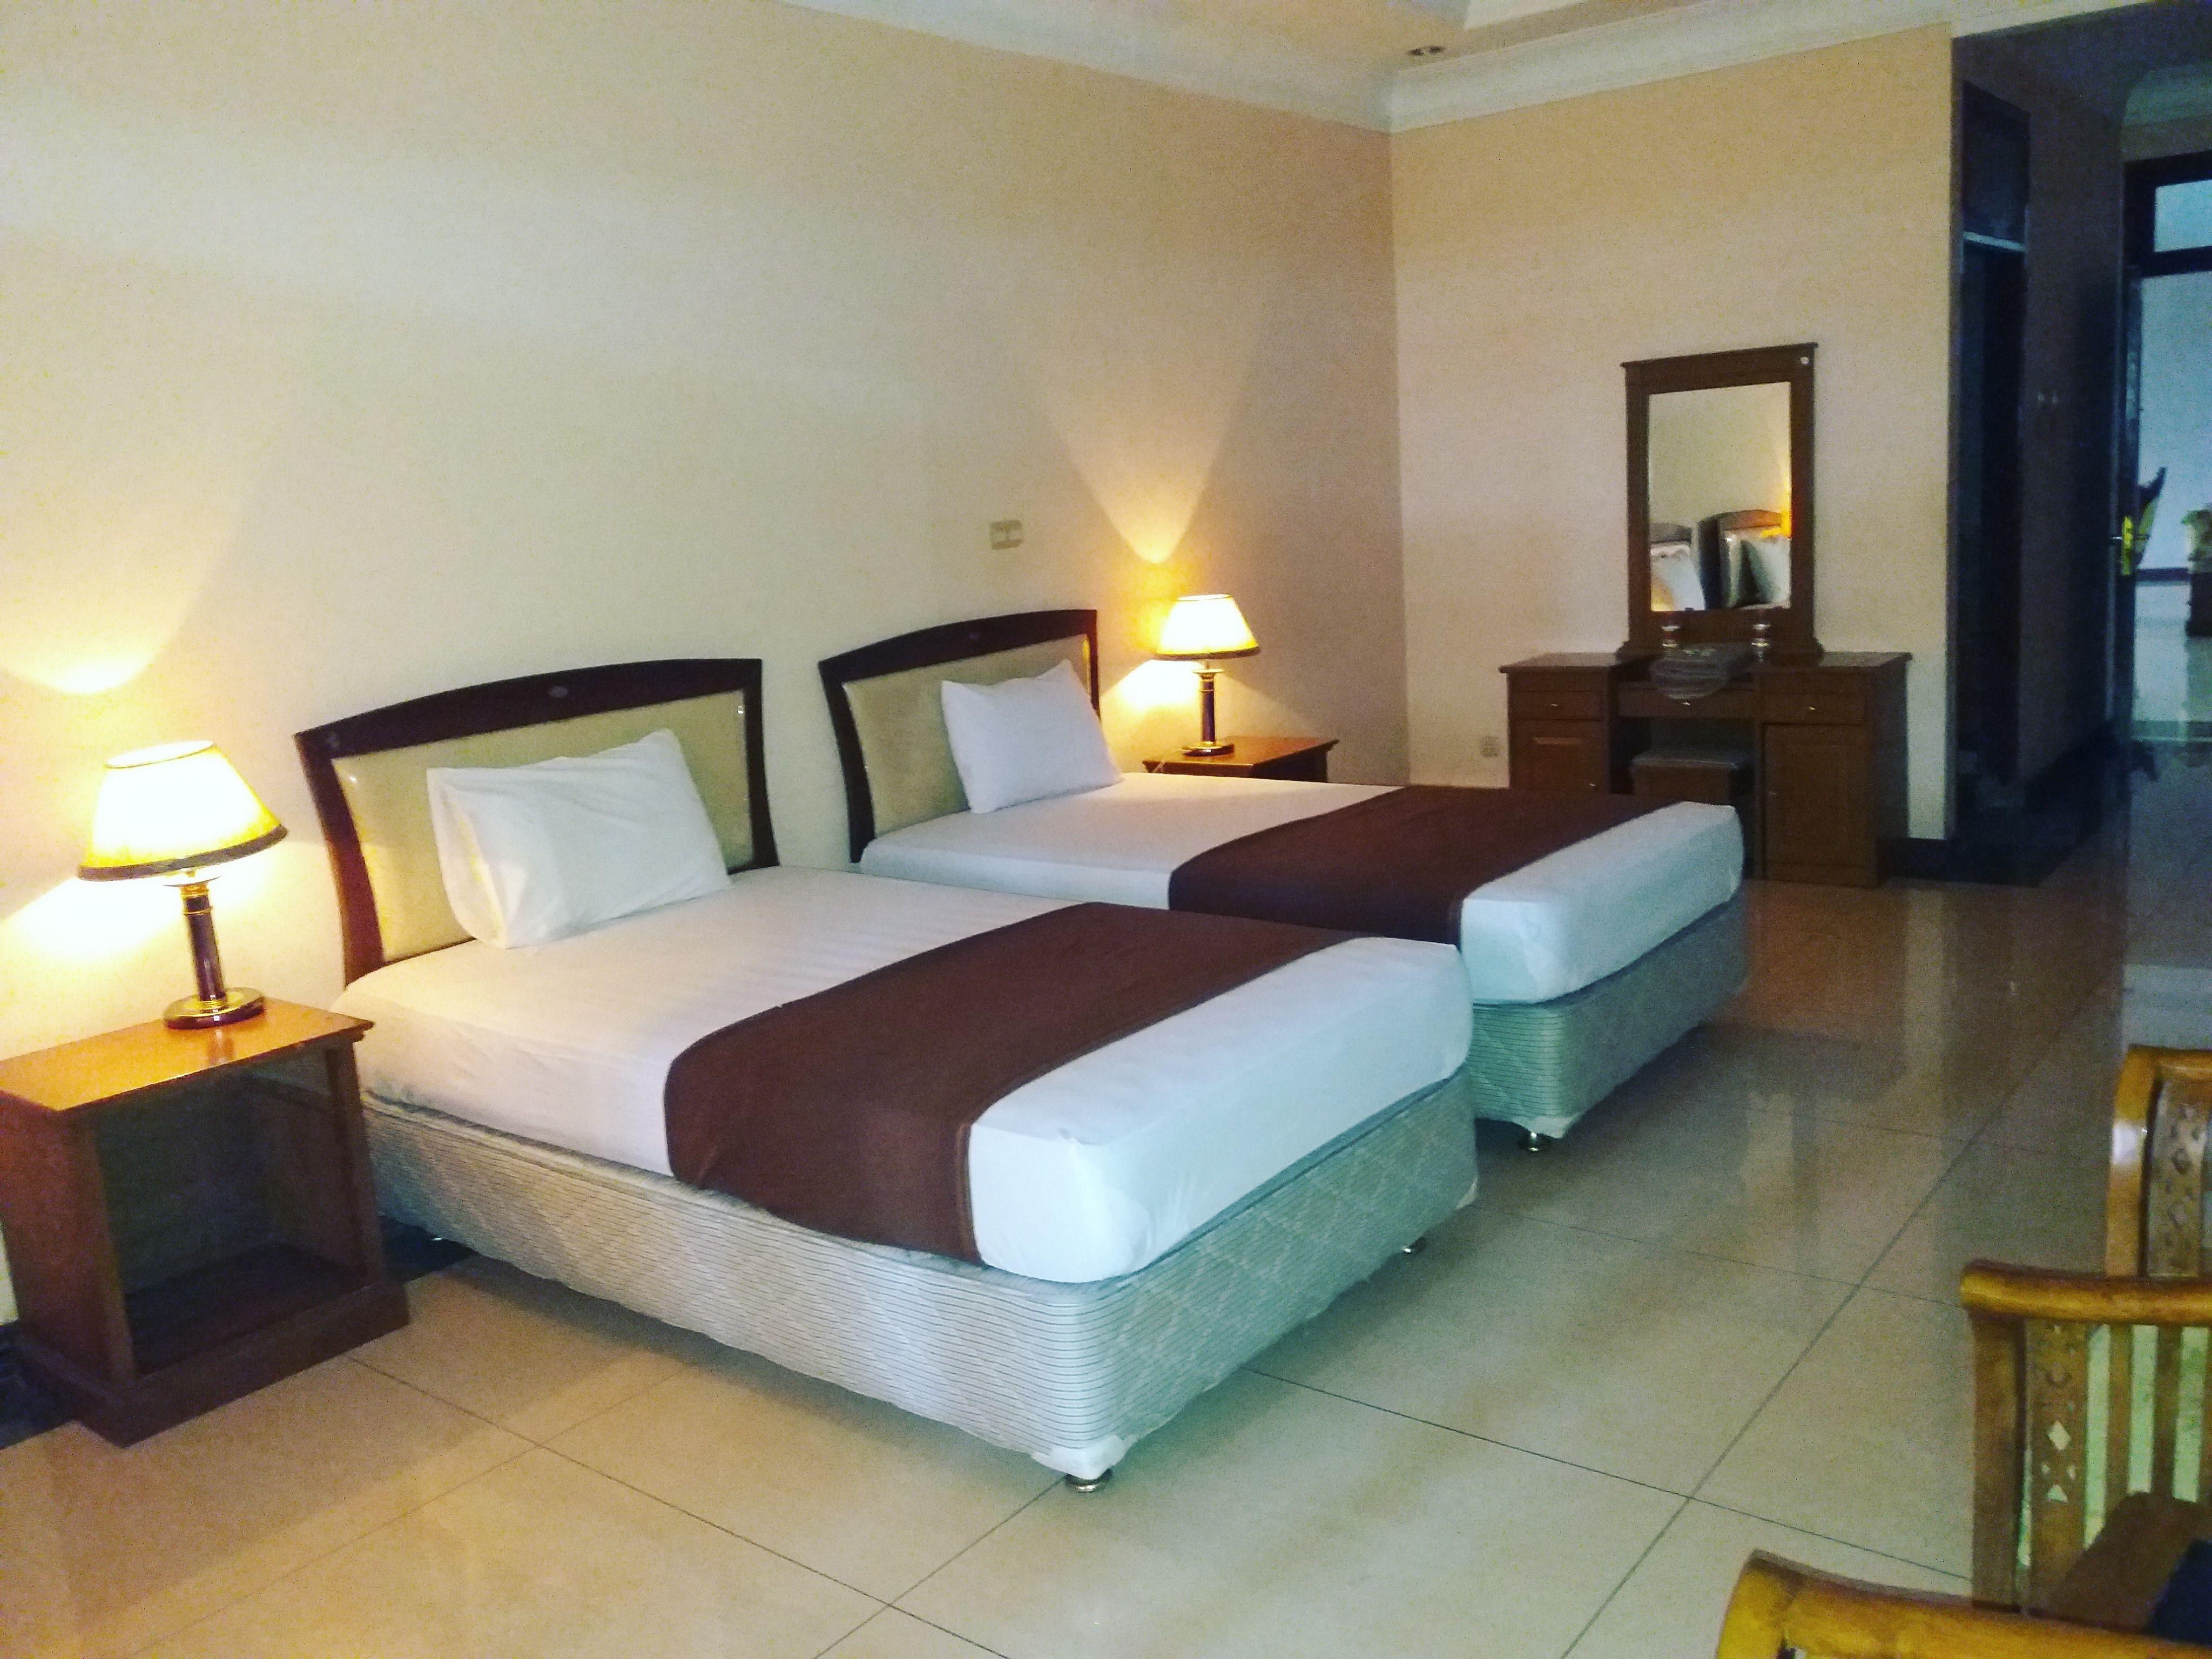 Astro Hotel Purwokerto, Banyumas